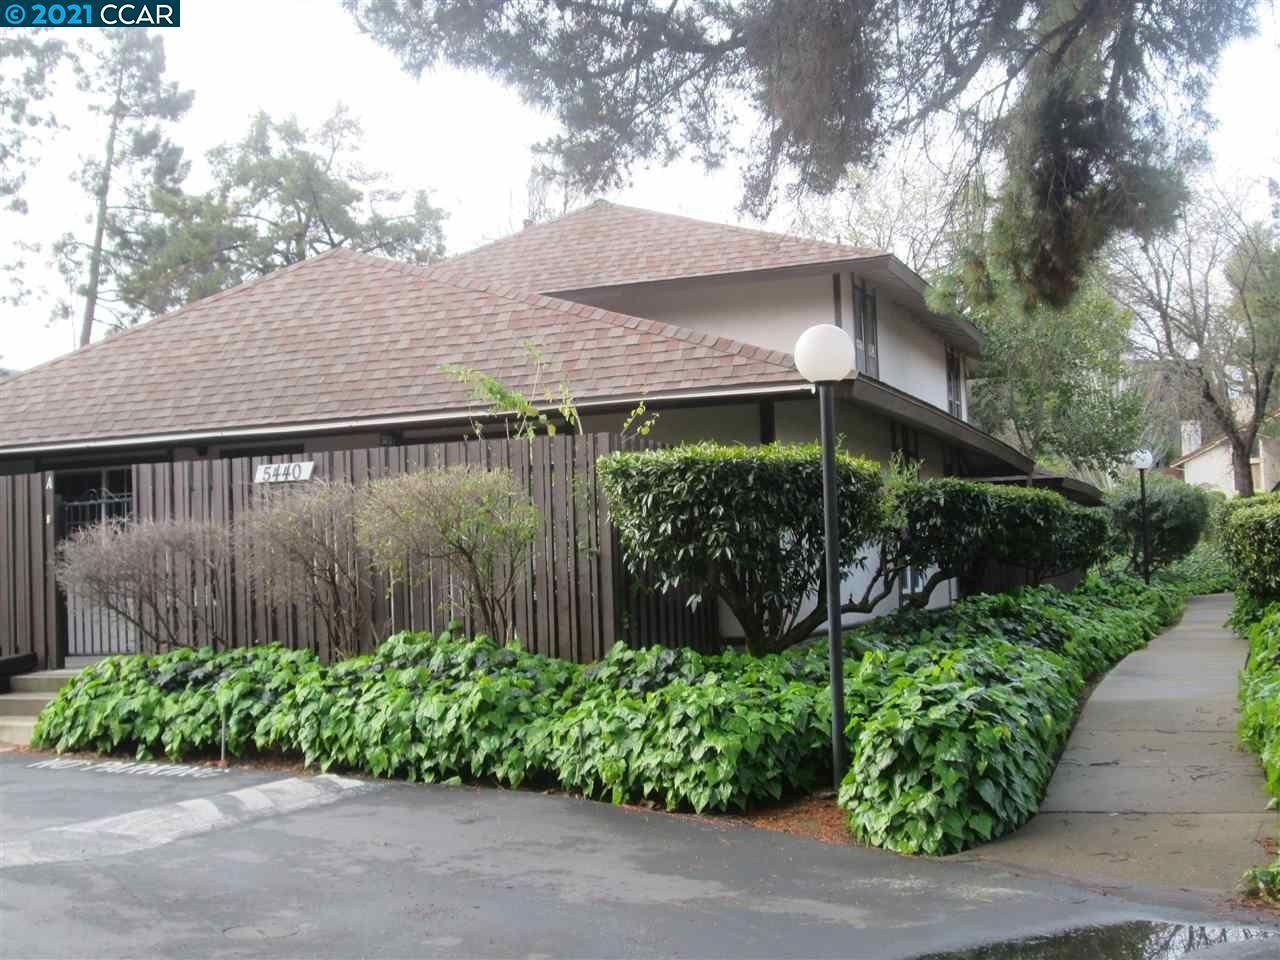 Photo of 5440 Roundtree Ct #B, CONCORD, CA 94521 (MLS # 40942071)